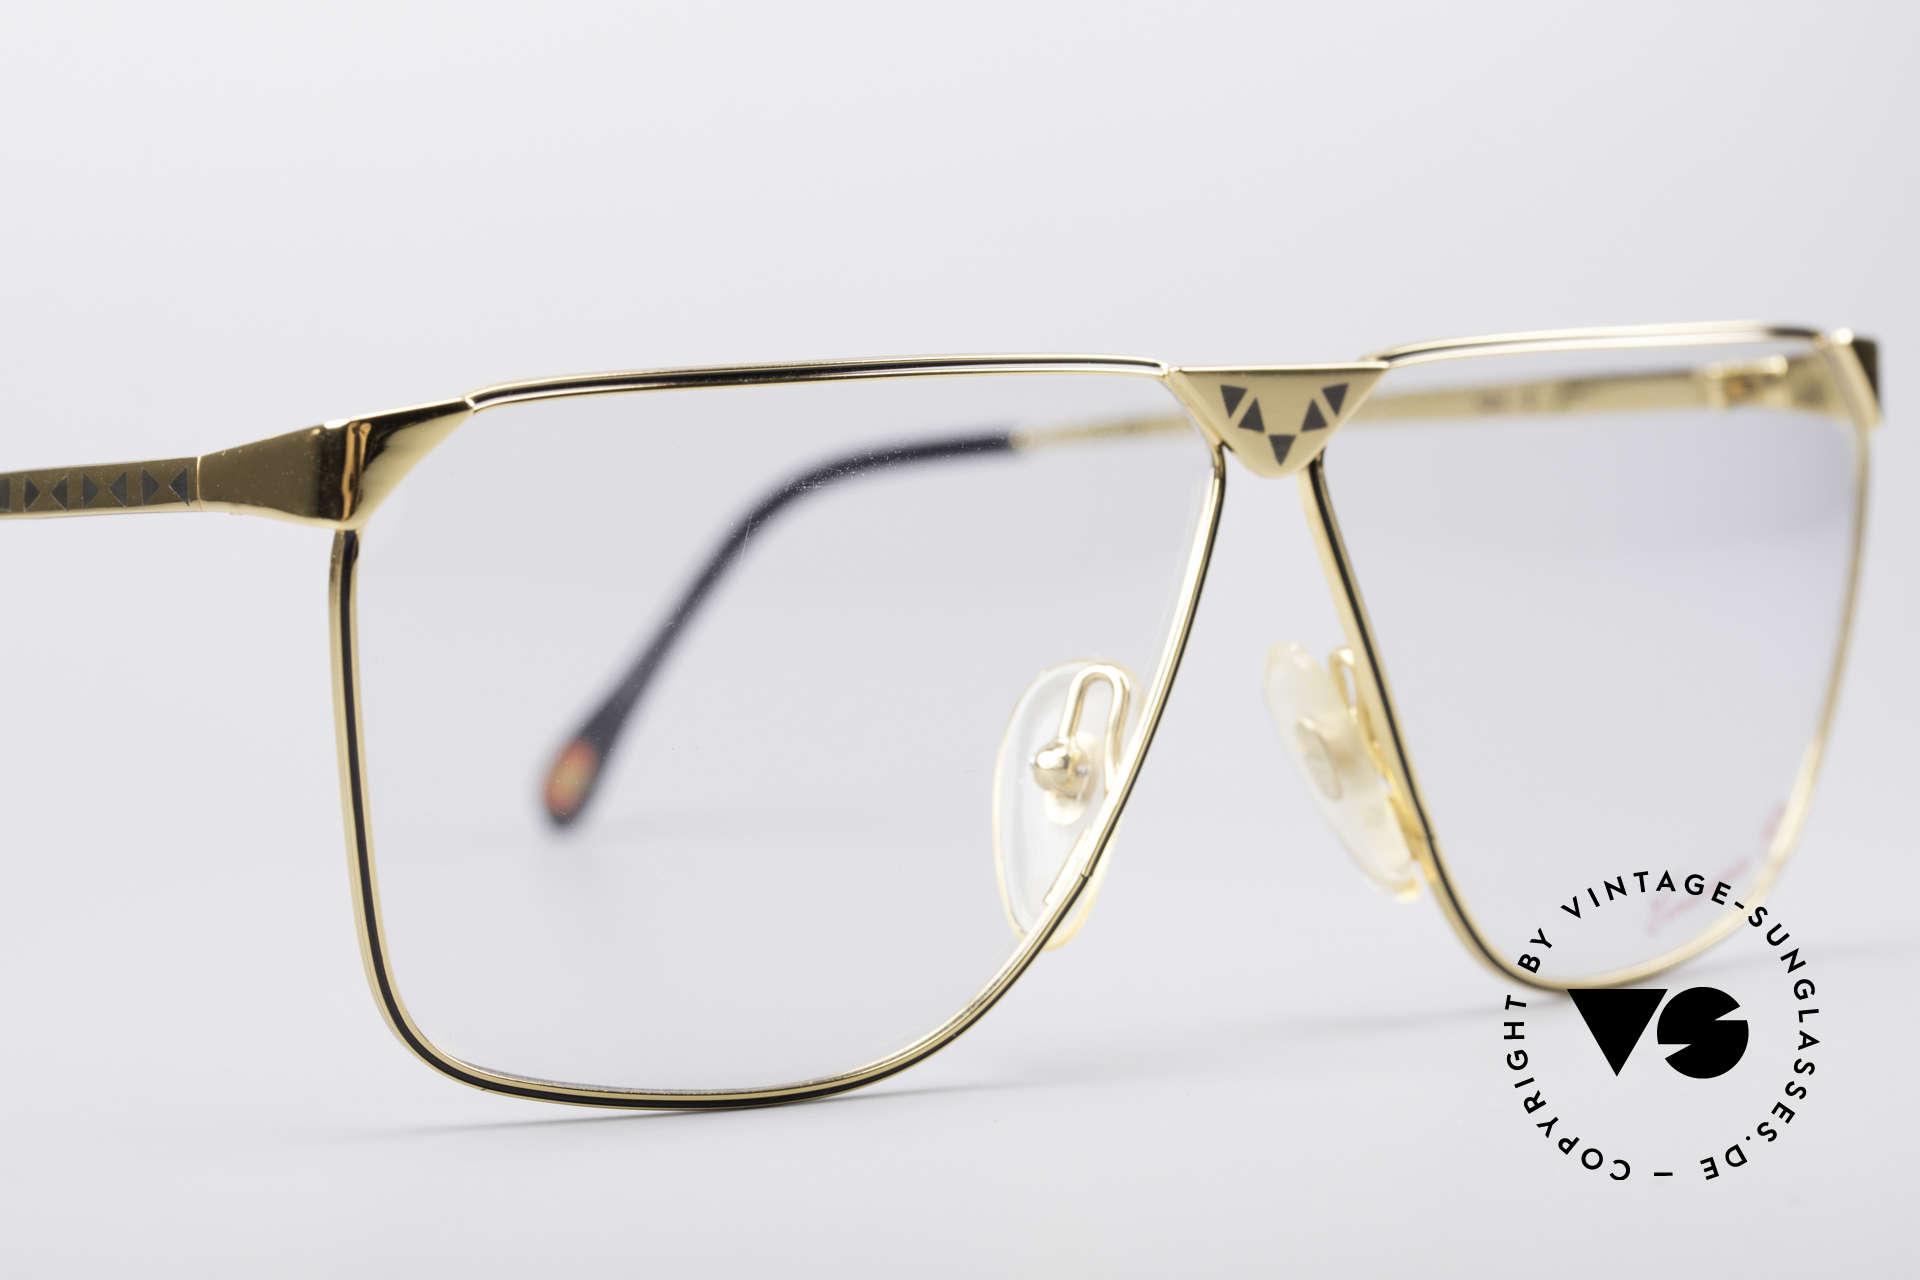 Casanova NM9 No Retro 80's Vintage Glasses, NOS - unworn (like all our vintage Casanova frames), Made for Men